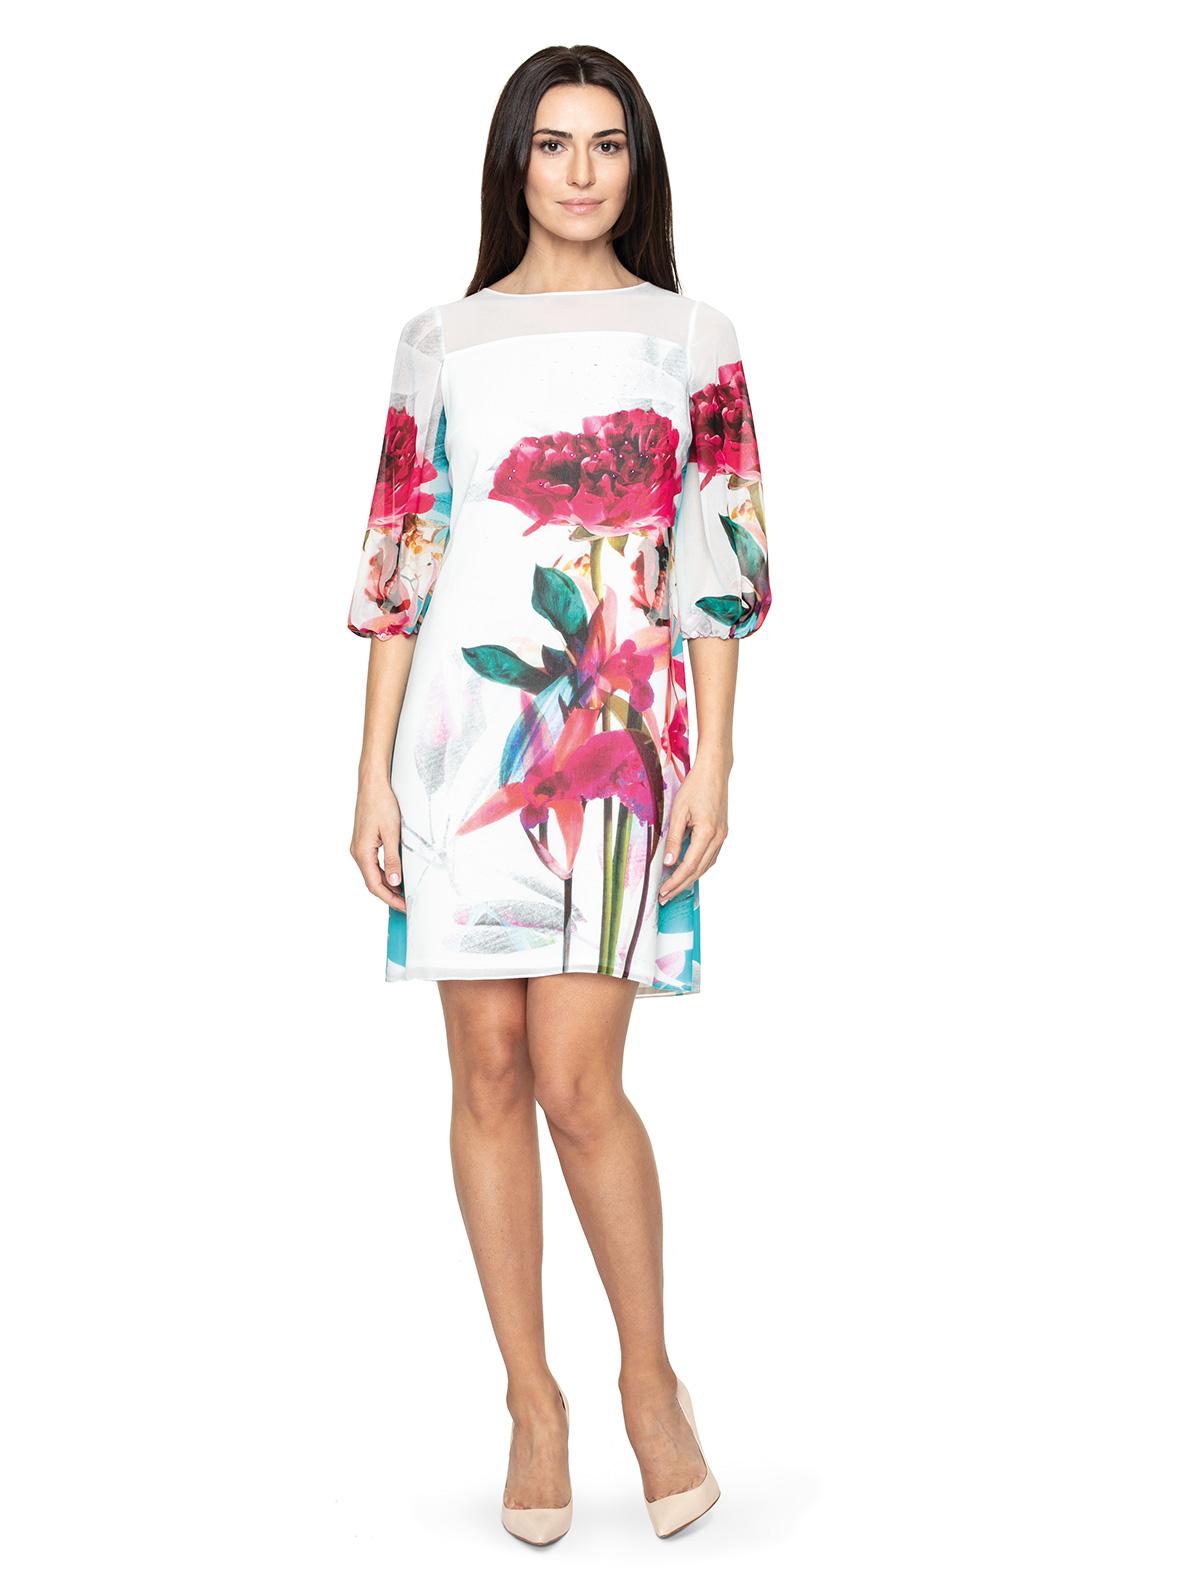 53accdb152 Suknie wieczorowe i sukienki koktajlowe Potis   Verso producent sukienek